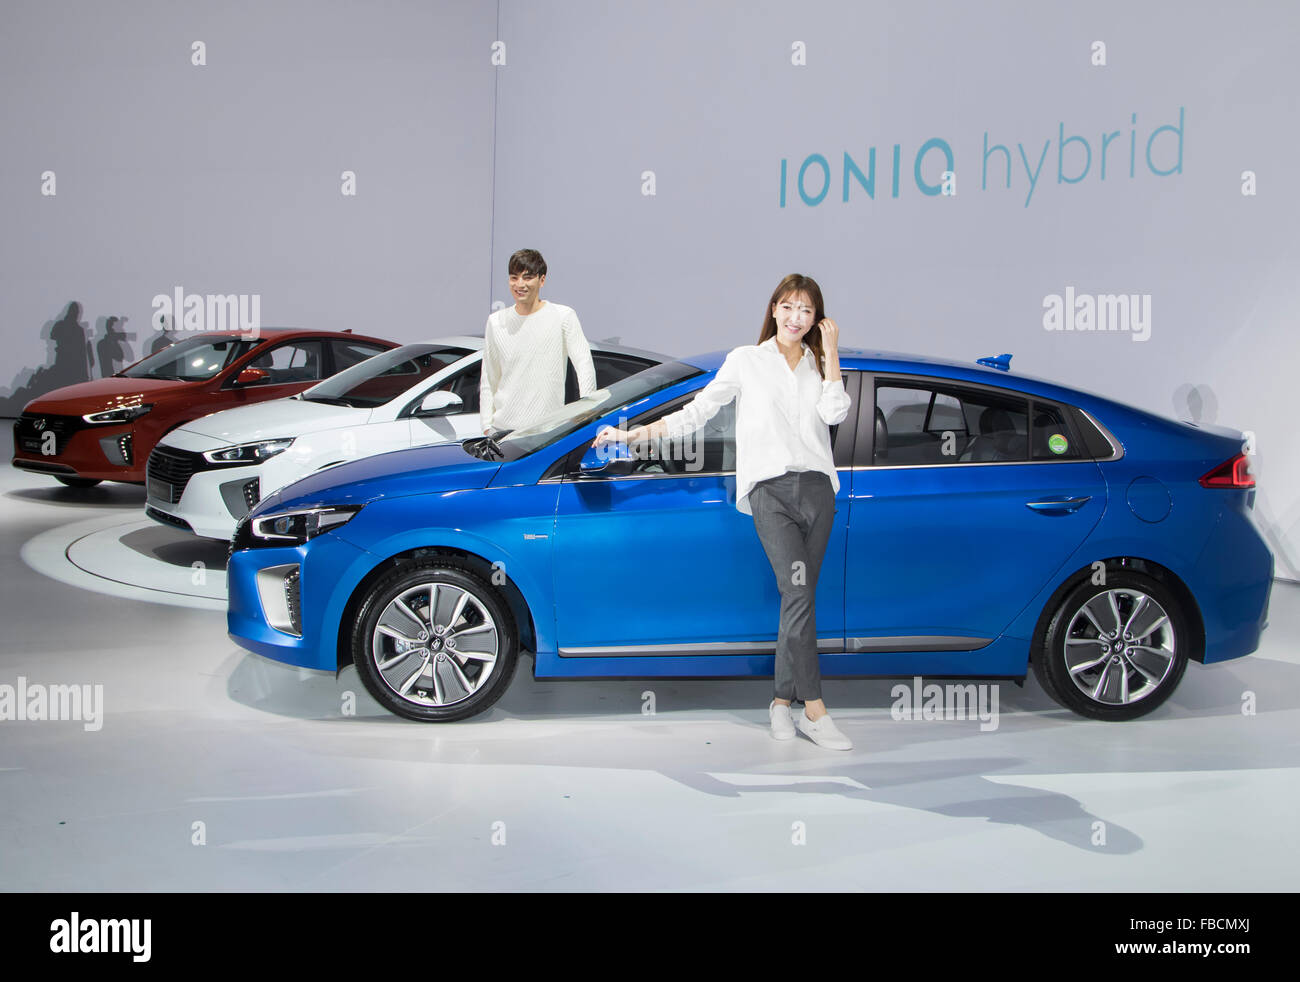 Ioniq Hybrid, Jan 14, 2016 : Models pose next to Hyundai Motor's Ioniq hybrid cars during a press conference - Stock Image